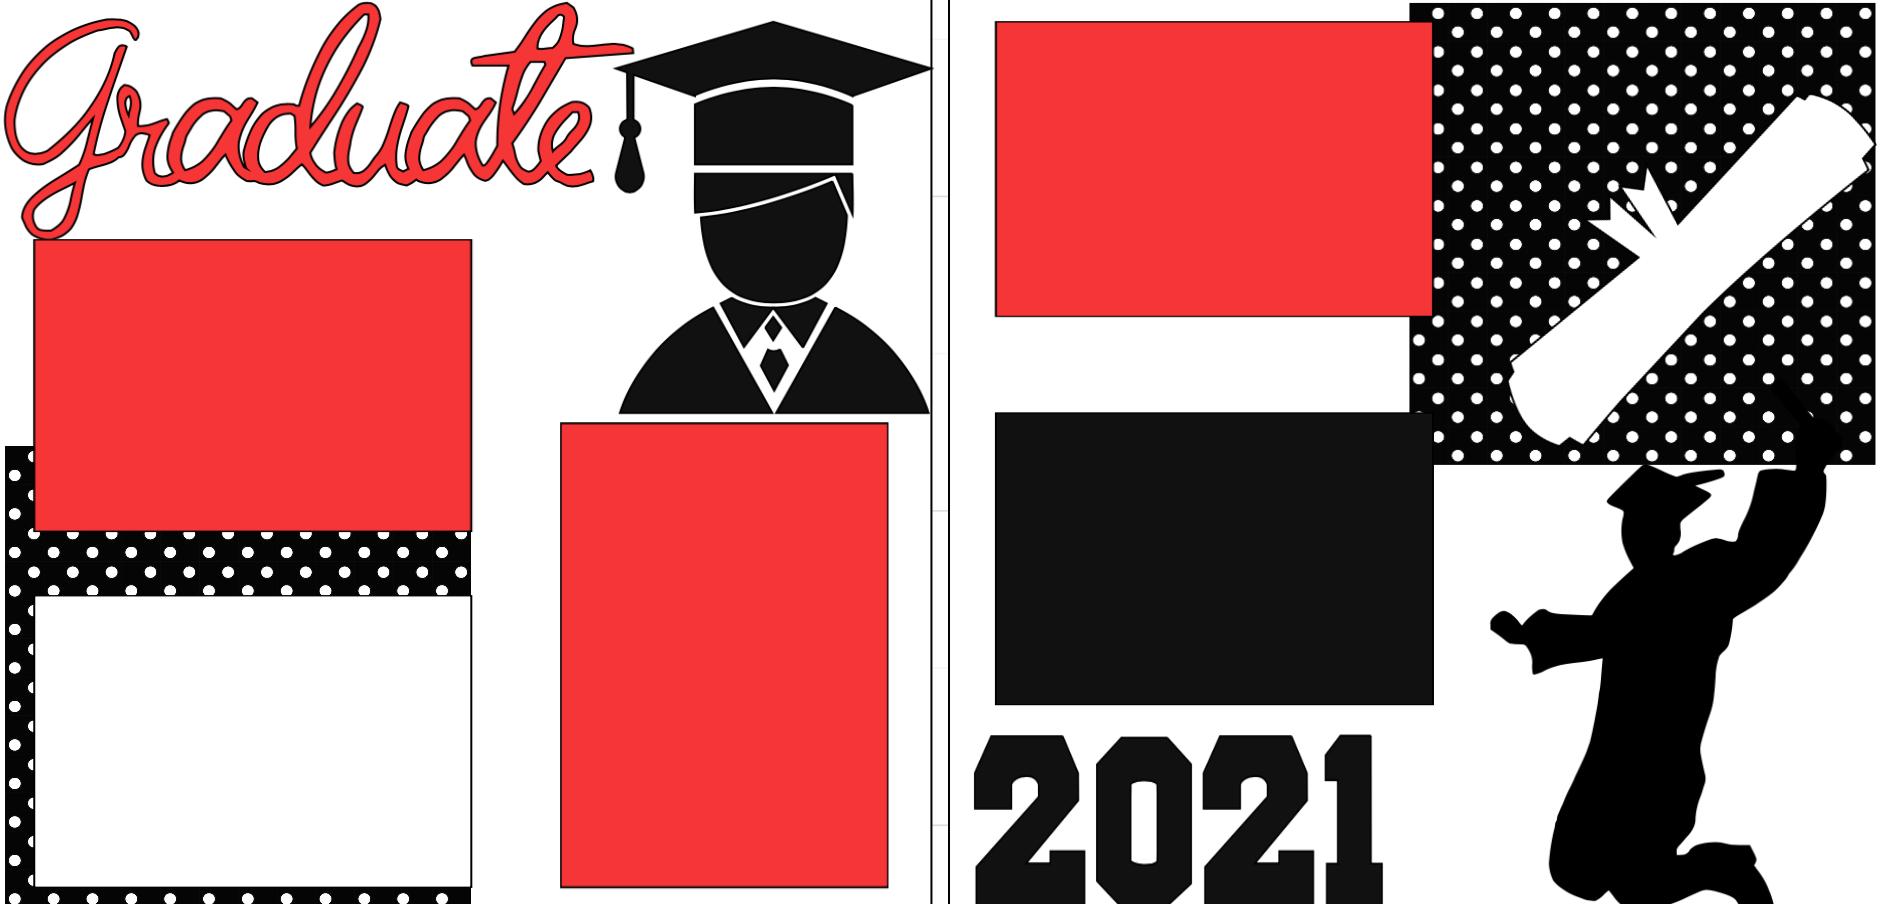 GRADUATE 2021 BOY  -basic page kit